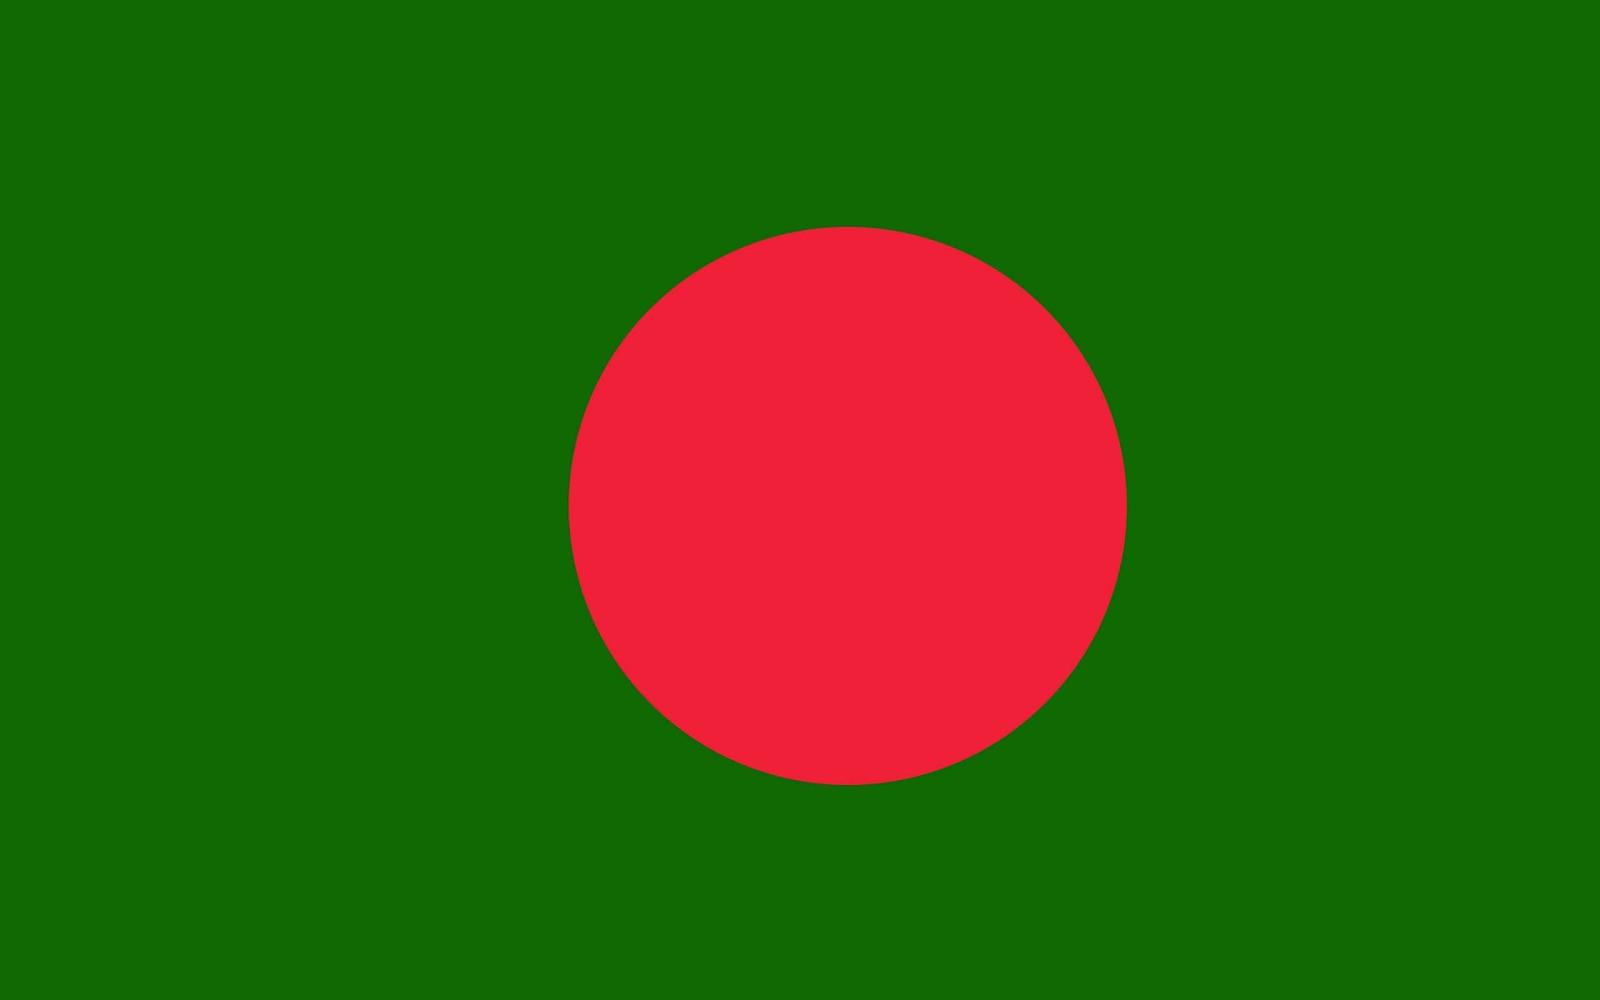 http://2.bp.blogspot.com/-QBiXynVX8tw/UPUe_e4JUHI/AAAAAAAAAOM/FJpmp6Xeeqk/s1600/Bangladesh.jpg